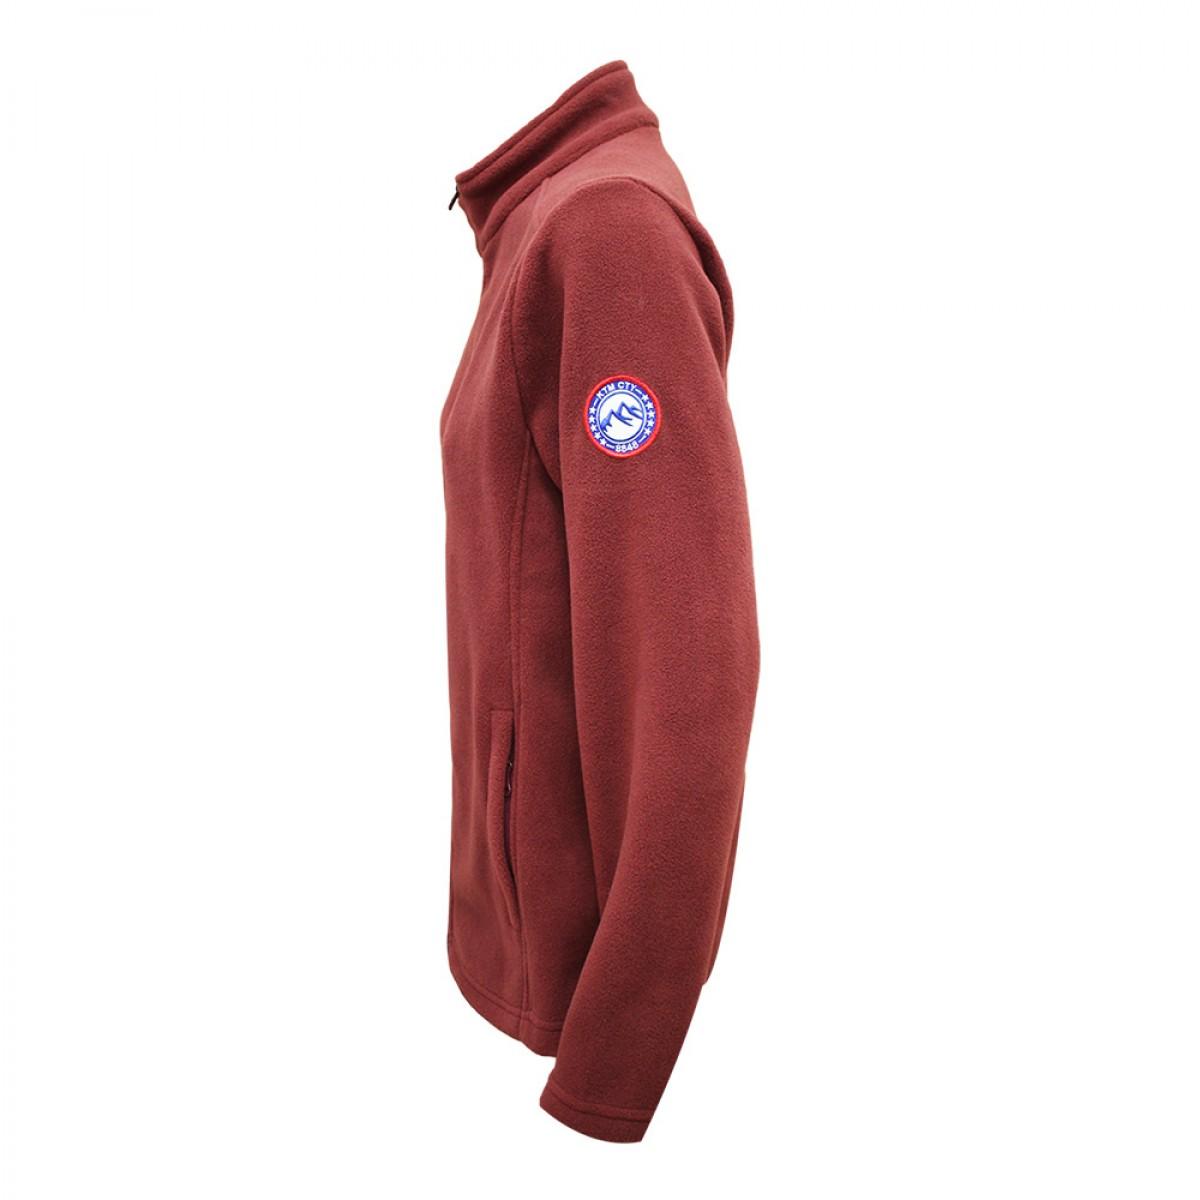 8848-women-thick-fleece-jacketkfj06850-11a